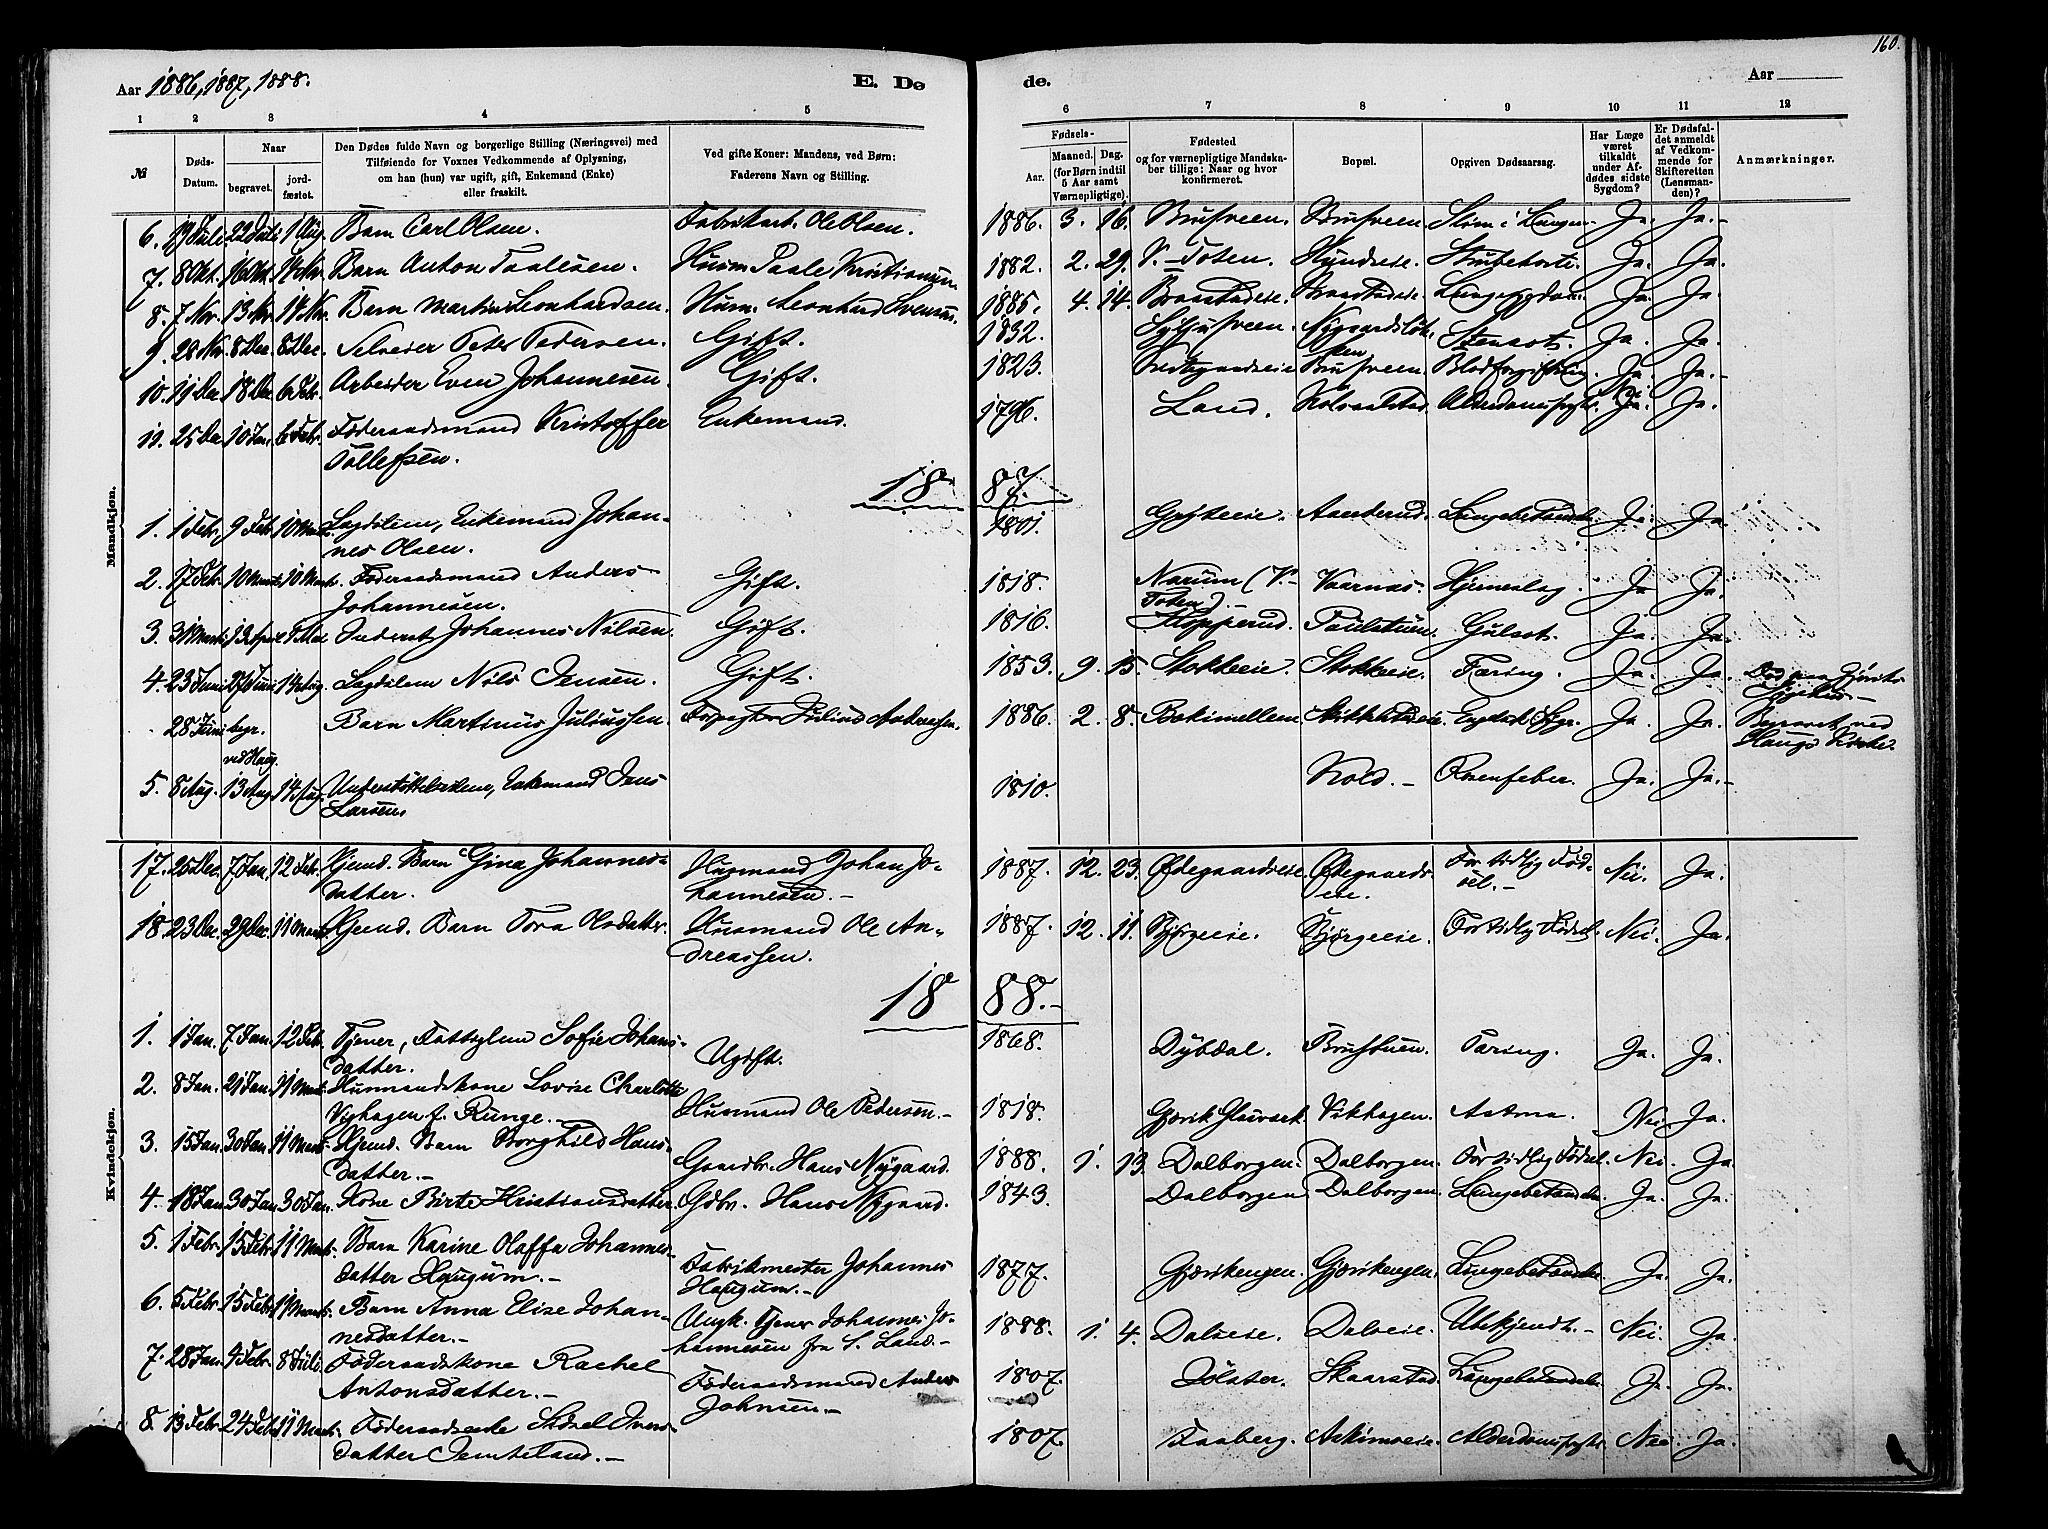 SAH, Vardal prestekontor, H/Ha/Haa/L0009: Ministerialbok nr. 9, 1878-1892, s. 160